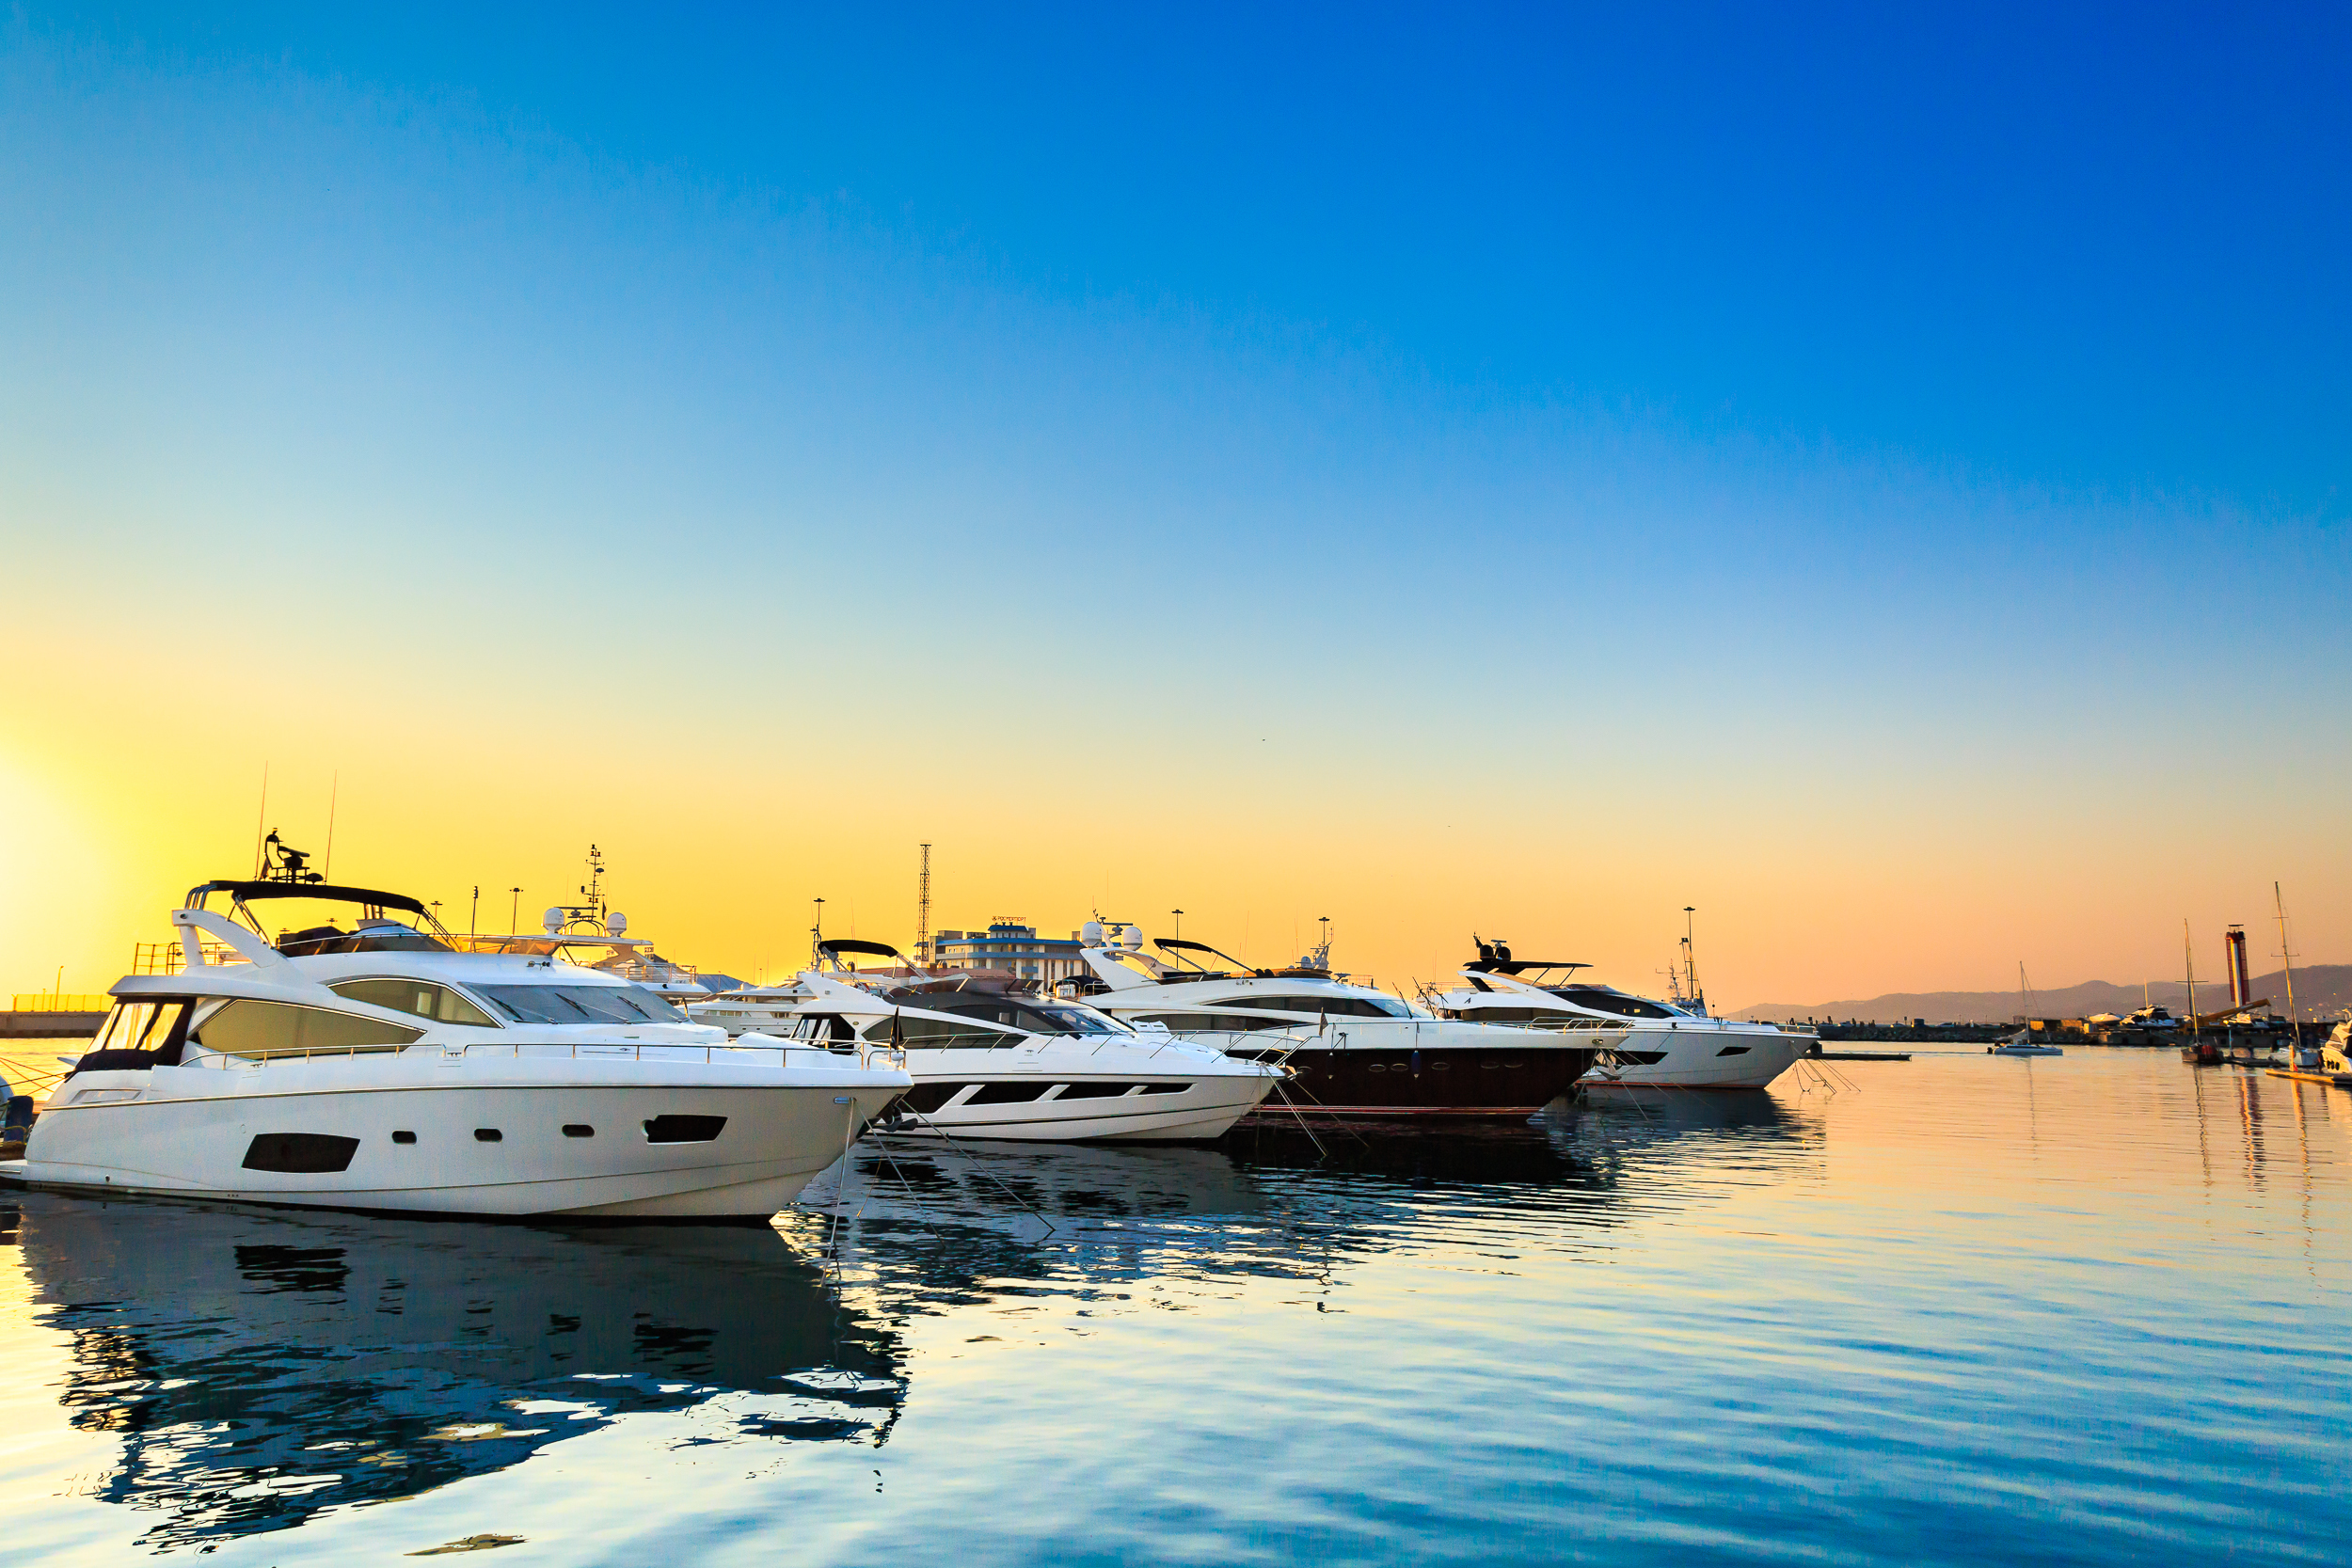 5 Mid-Season Tips for Boat Maintenance